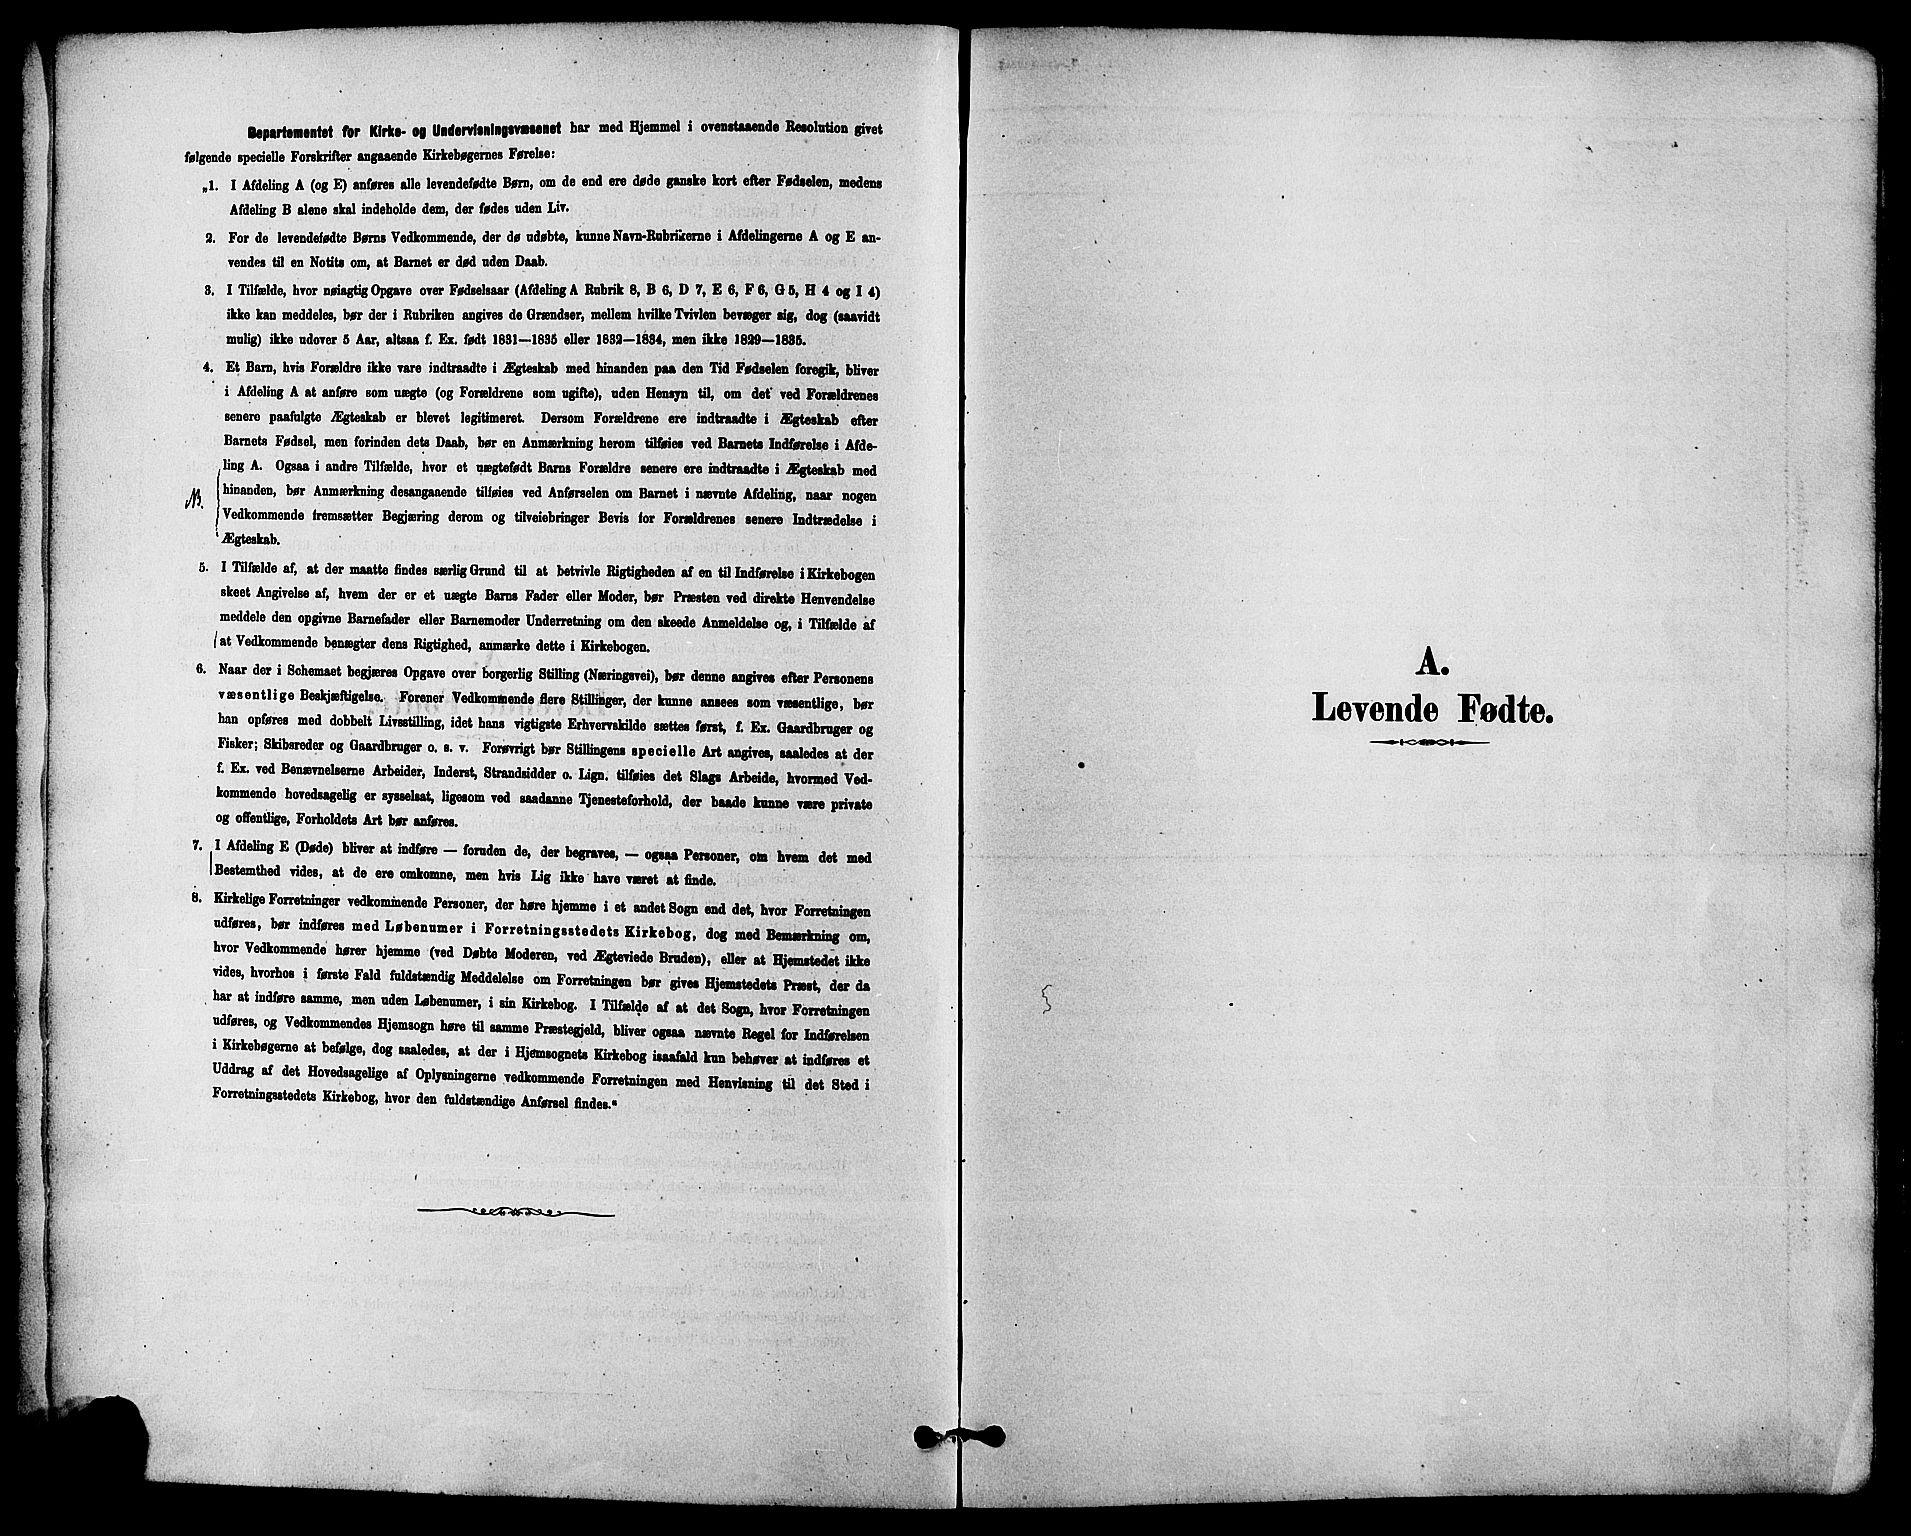 SAKO, Solum kirkebøker, F/Fa/L0009: Ministerialbok nr. I 9, 1877-1887